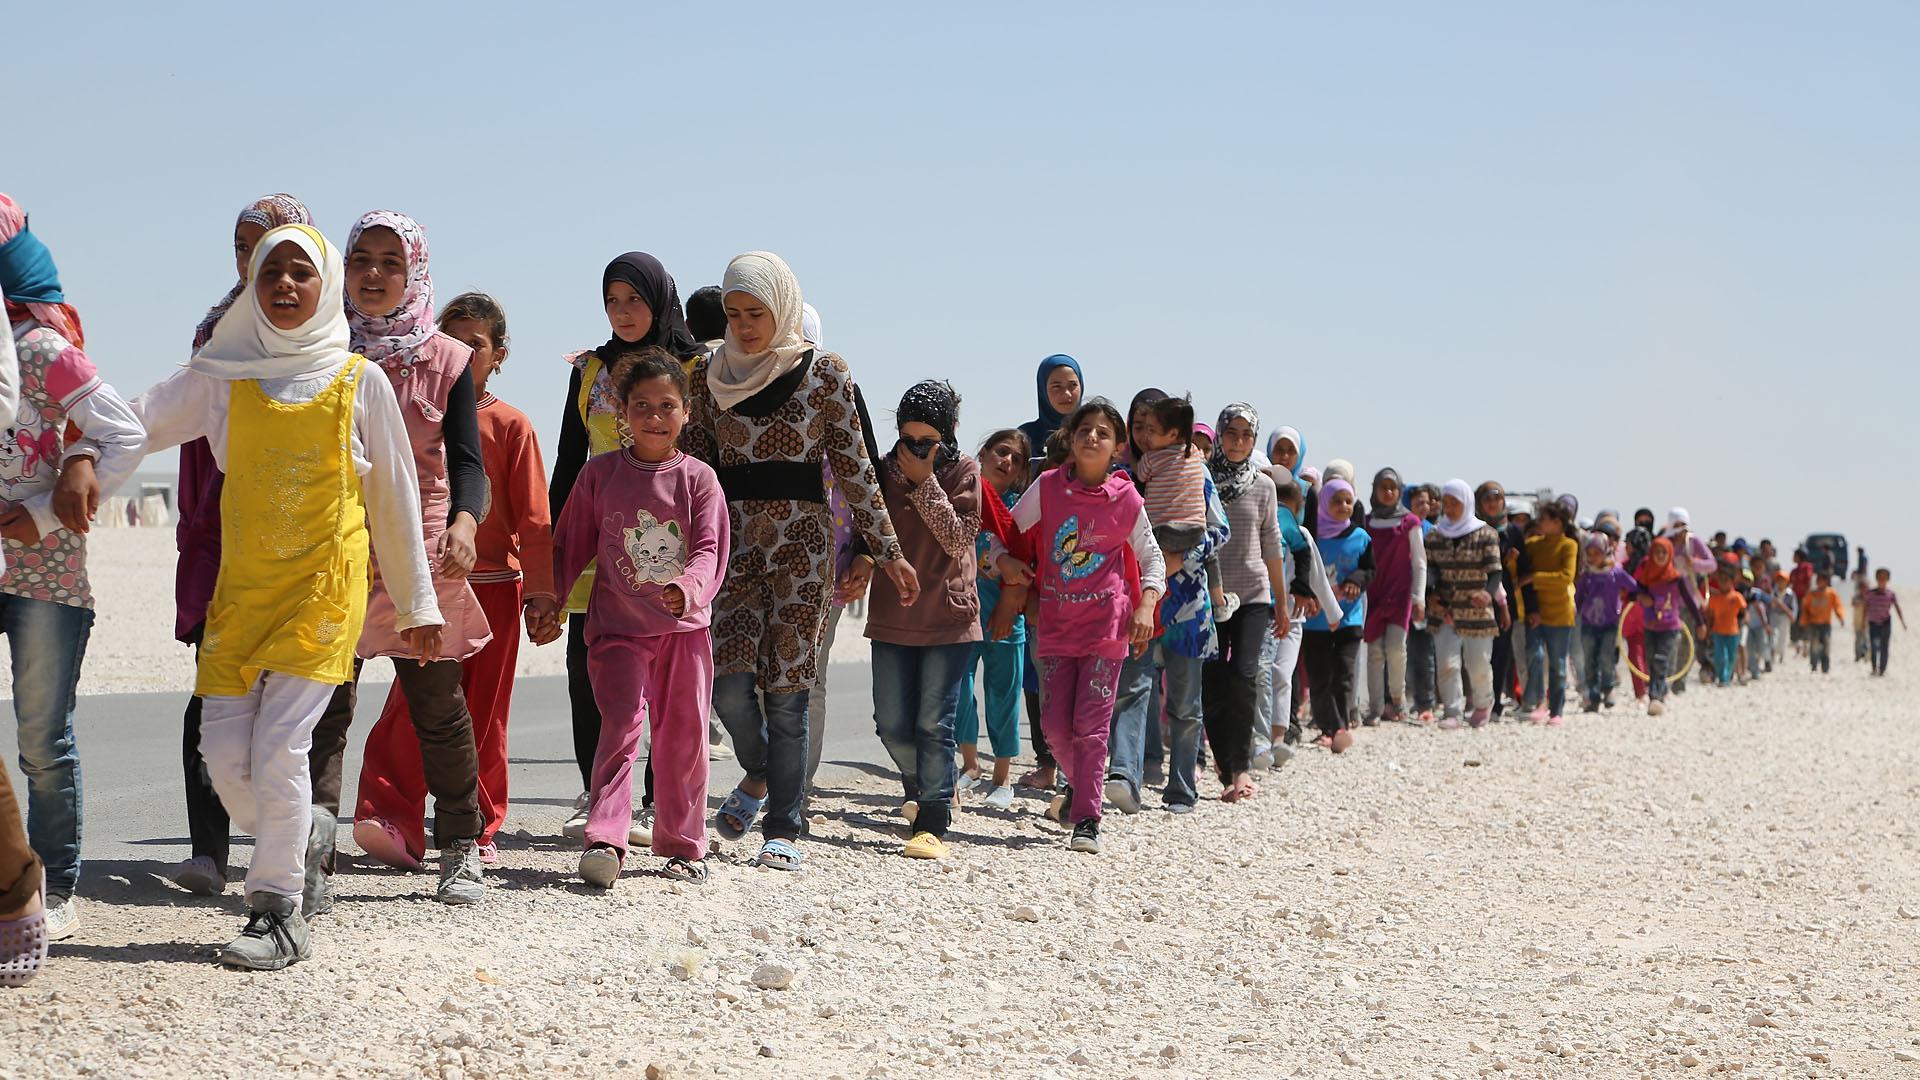 syrianrefugee91615.jpg